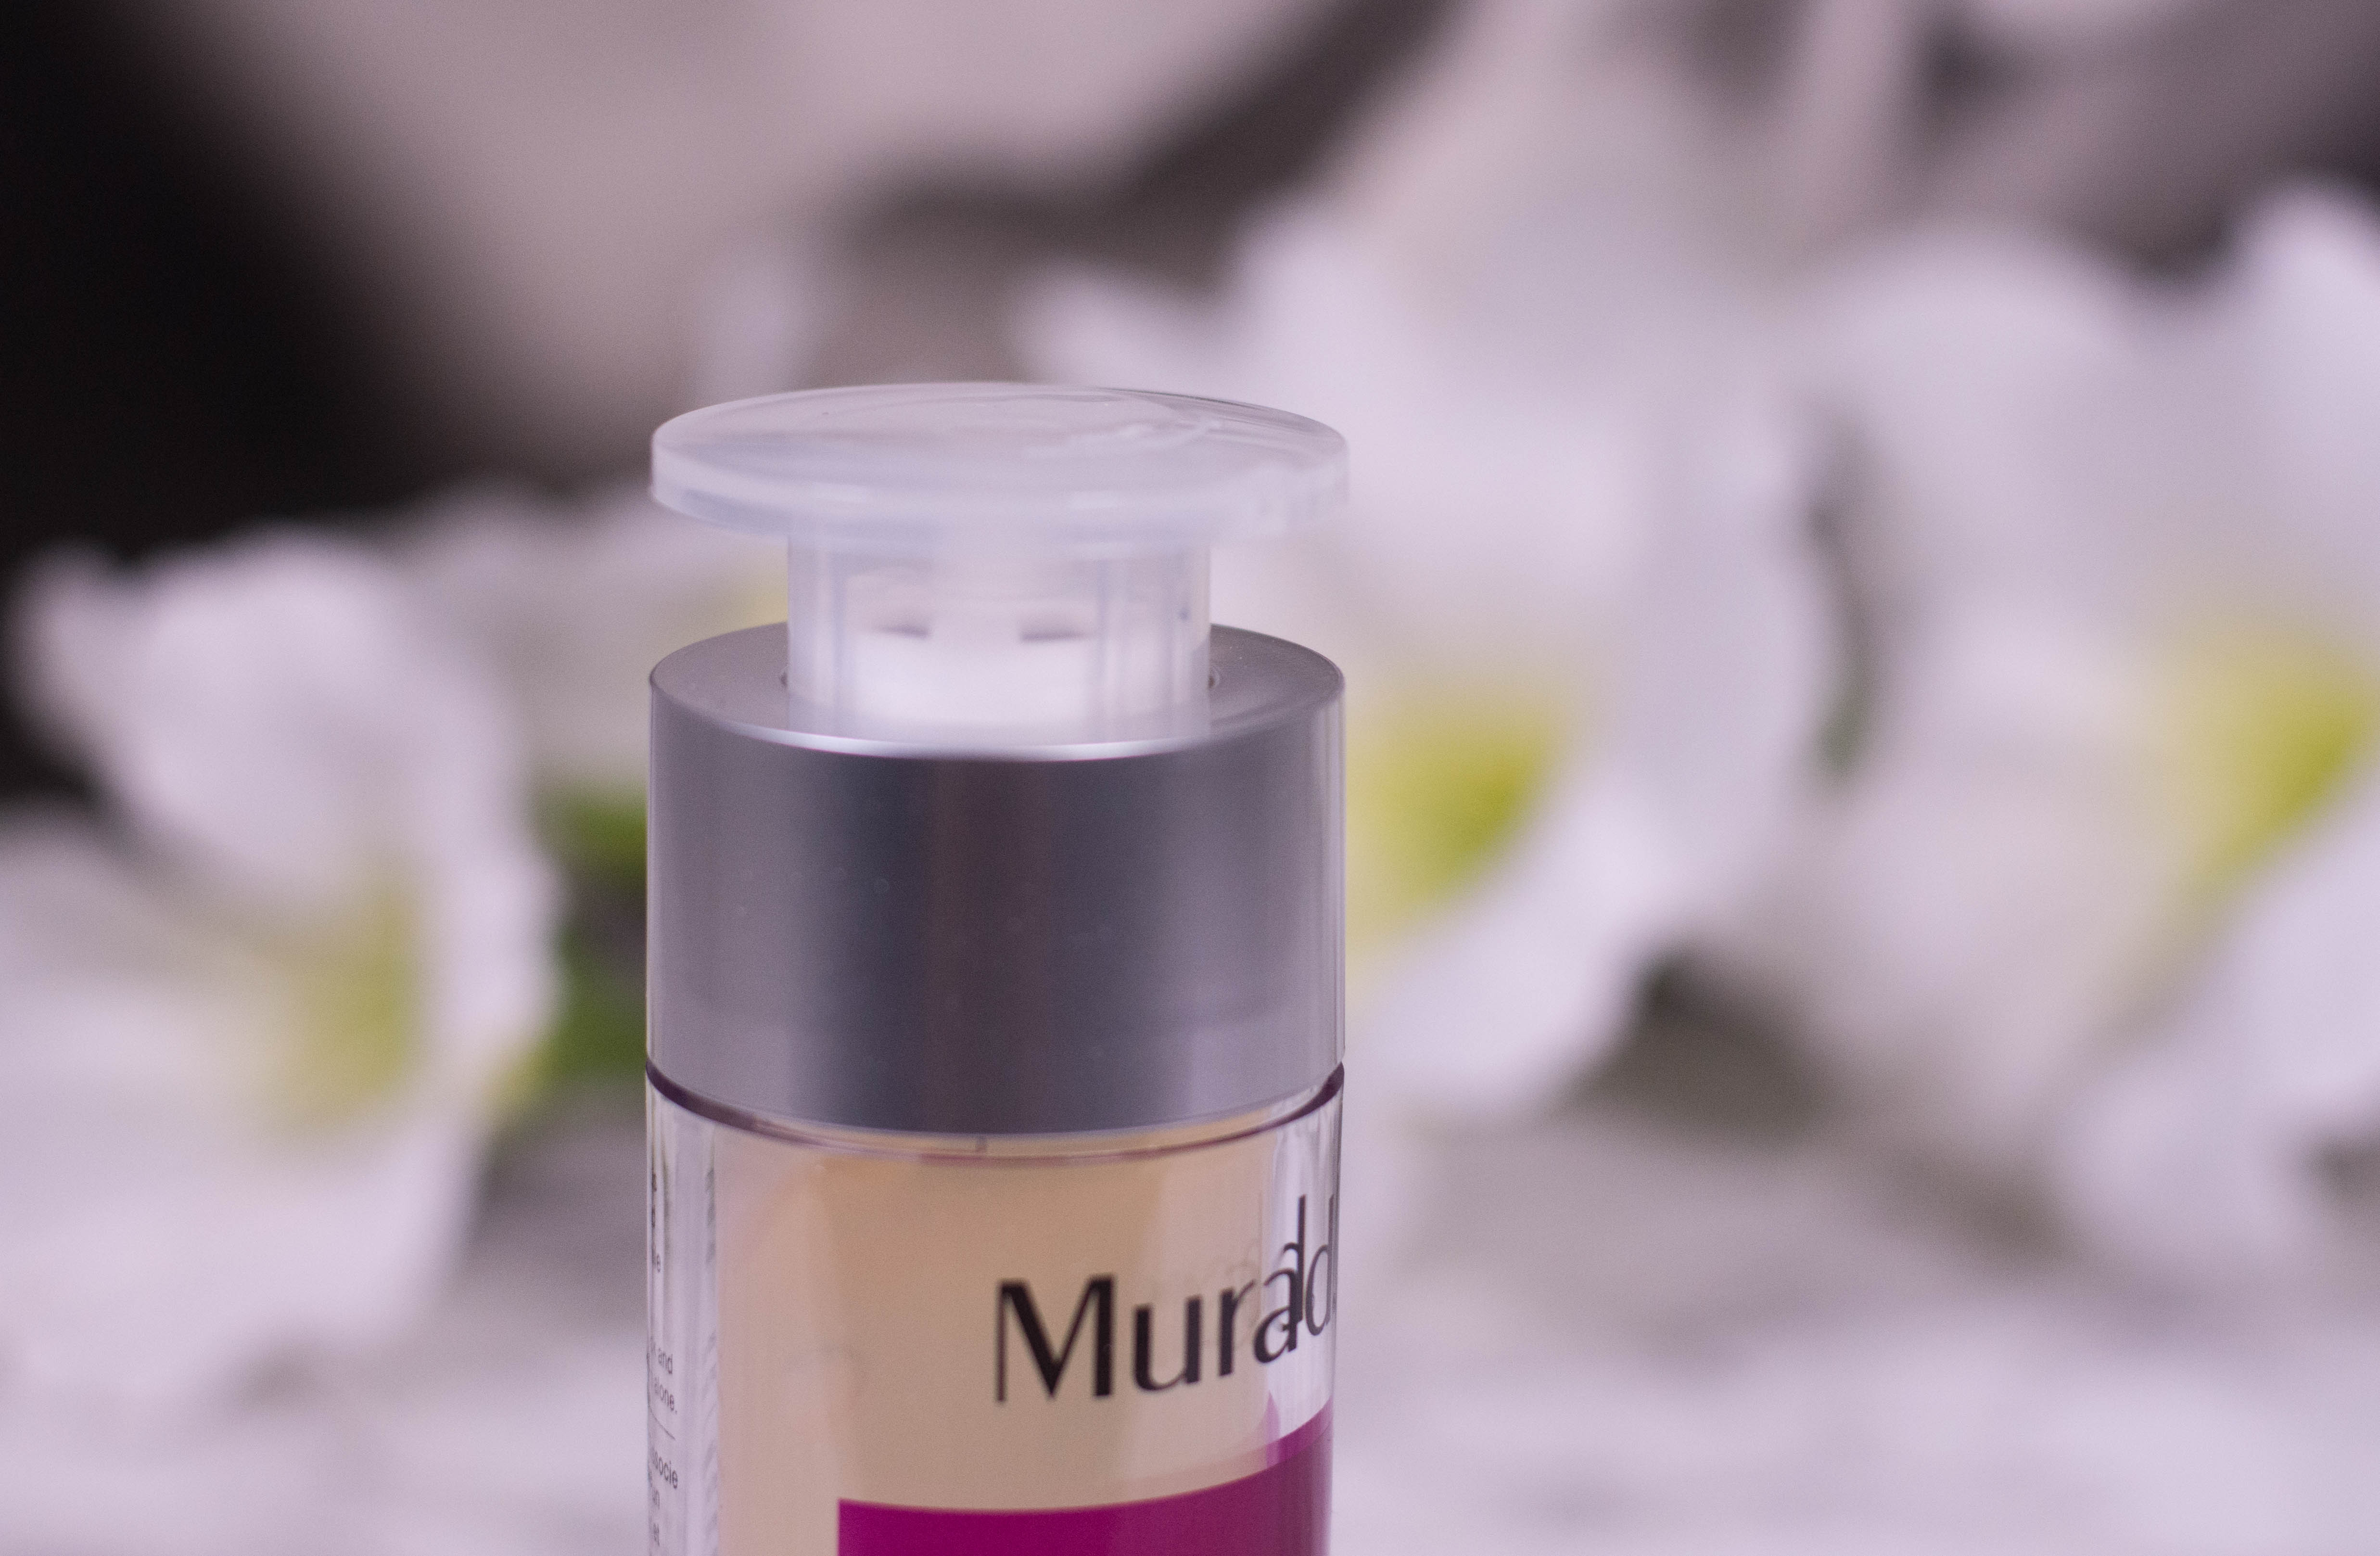 Murad Invisiblue Perfecting Shield